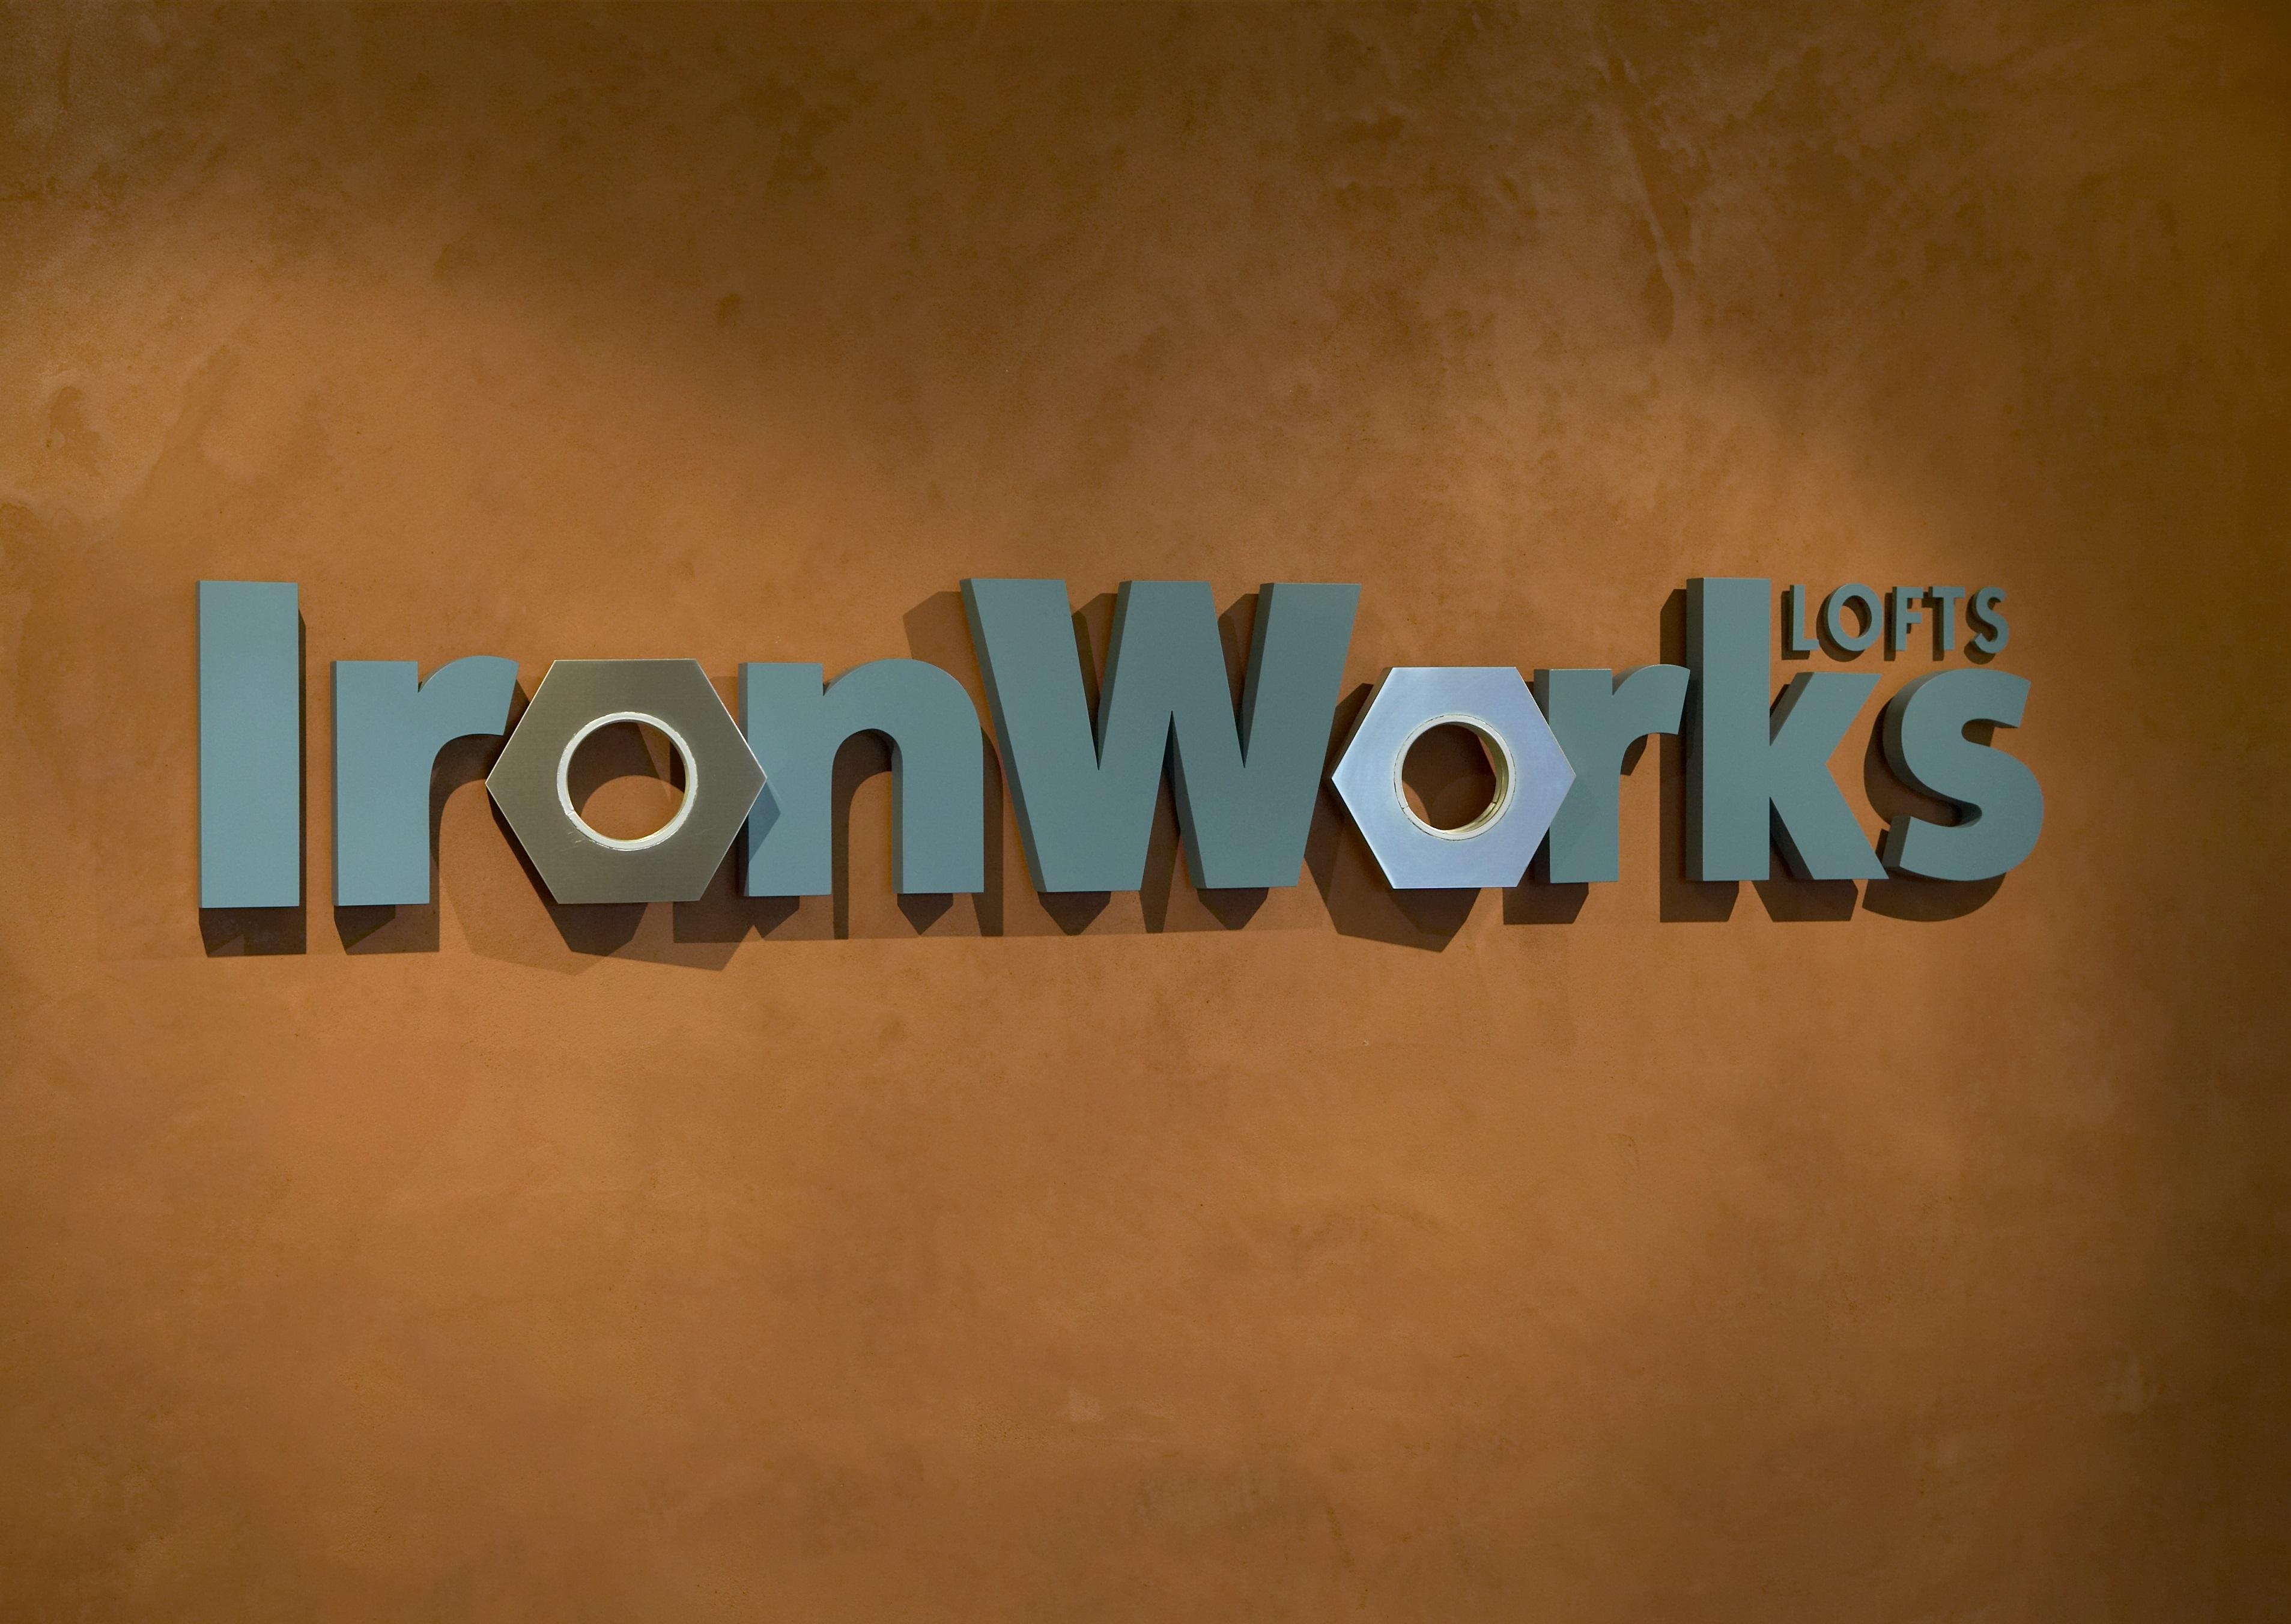 Ironwork Lofts Photos 003